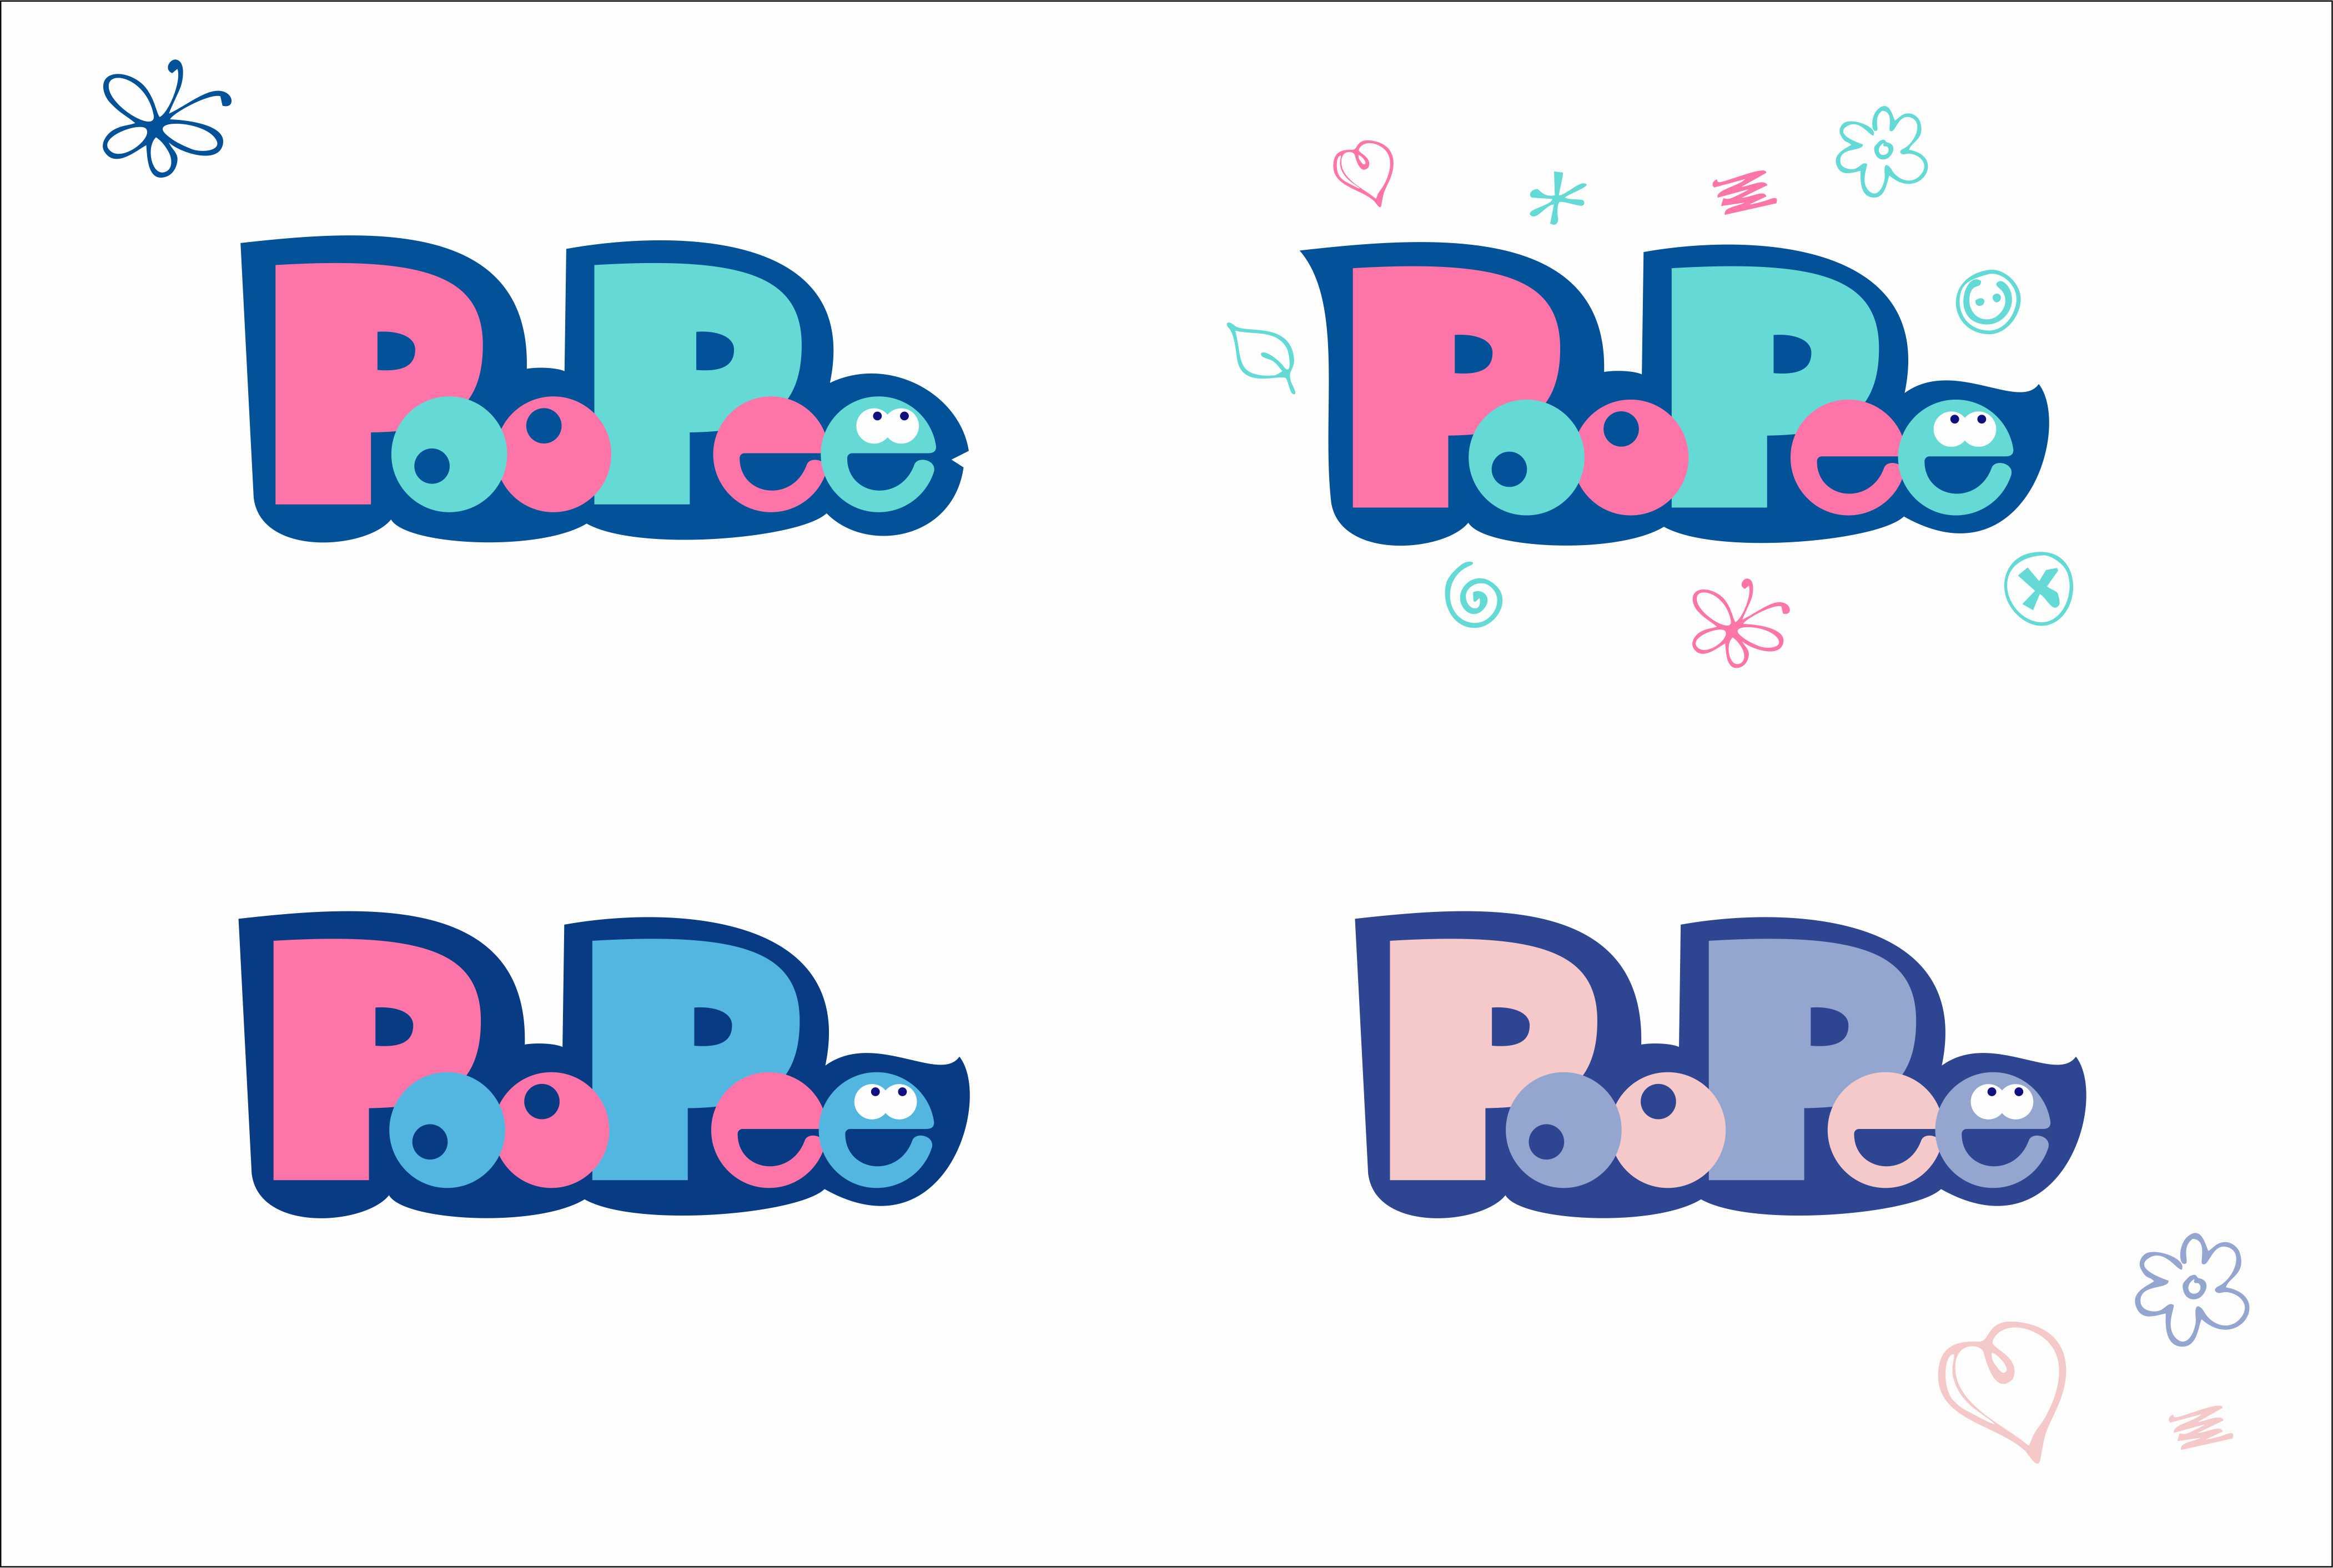 Разработка элементов фирменного стиля, логотипа и гайдлайна  фото f_0105ad48c4154425.jpg